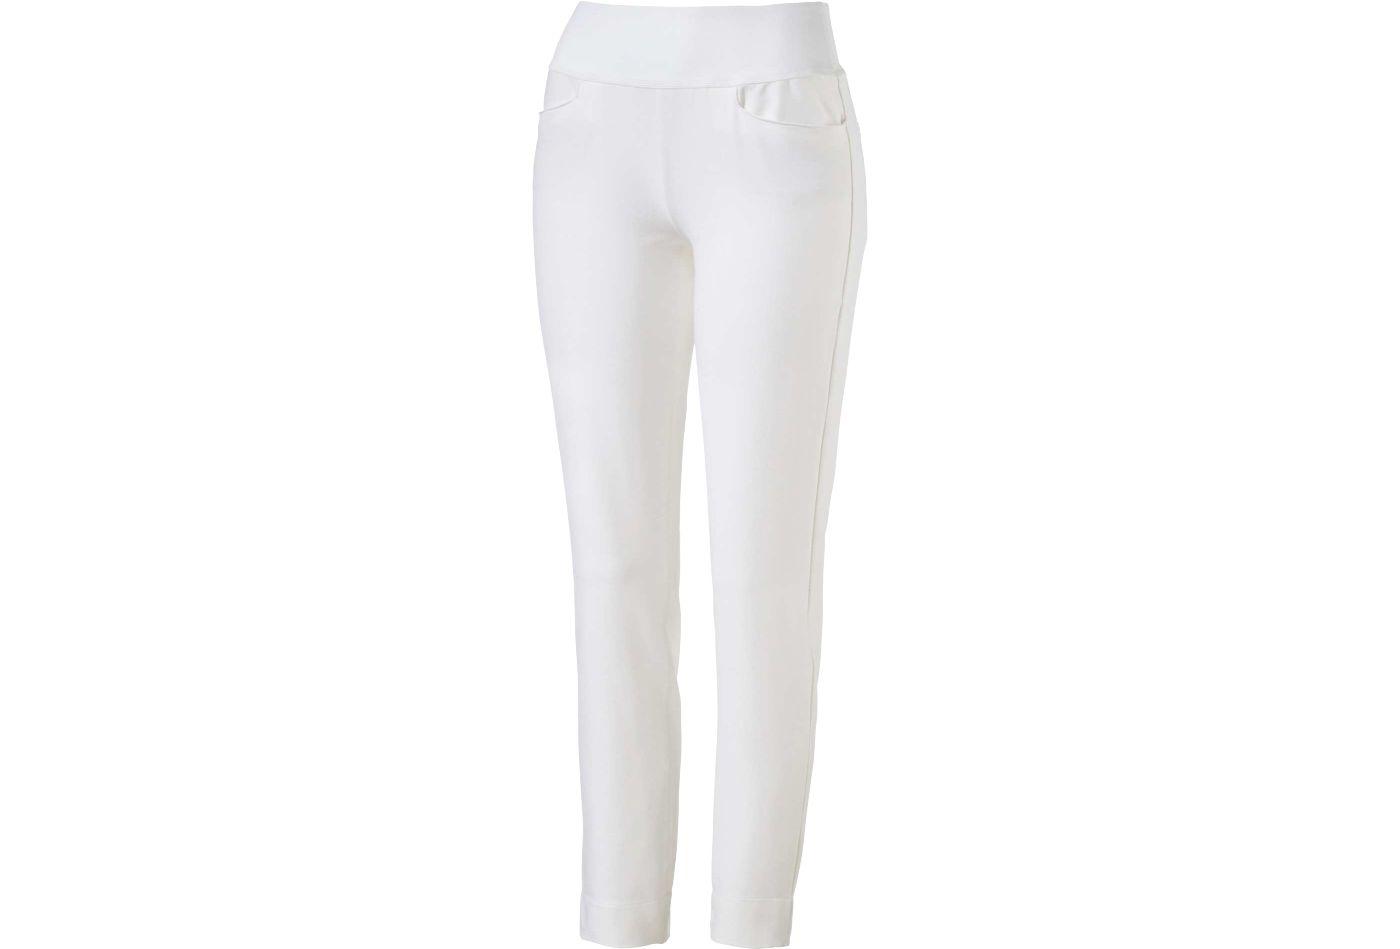 PUMA Women's PWRSHAPE Pull On Pants